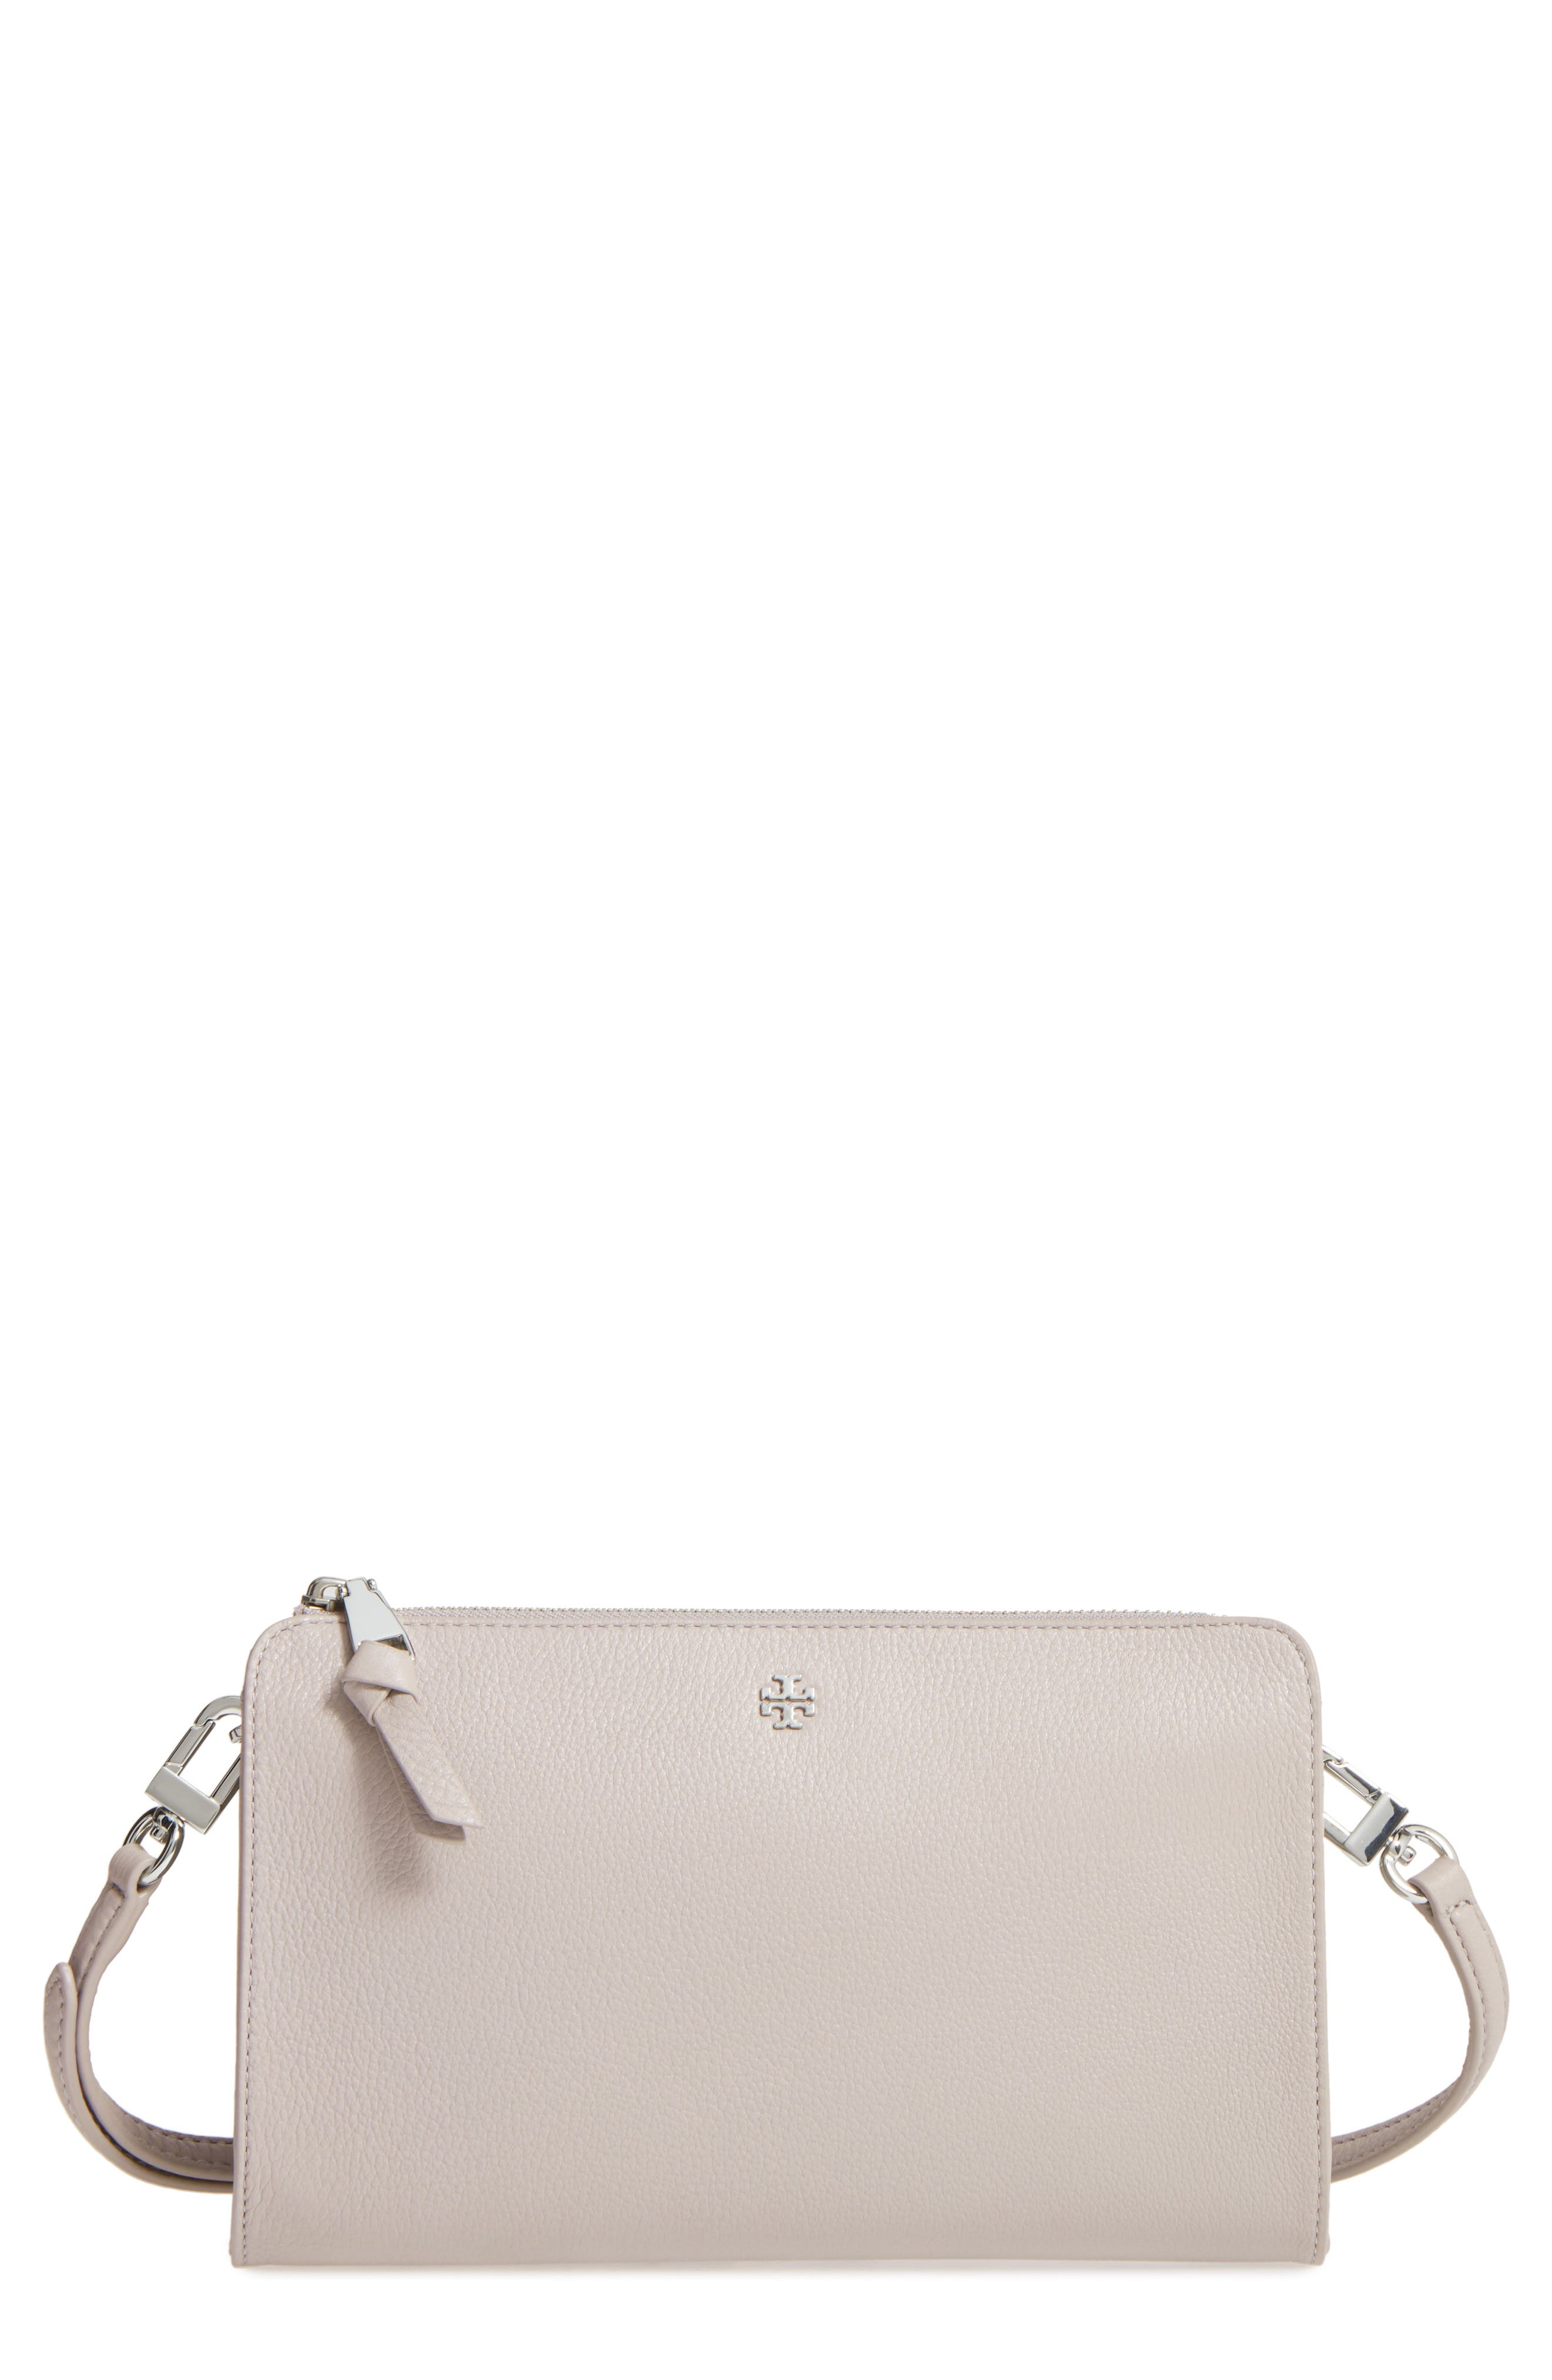 Main Image - Tory Burch Robinson Leather Wallet/Crossbody Bag